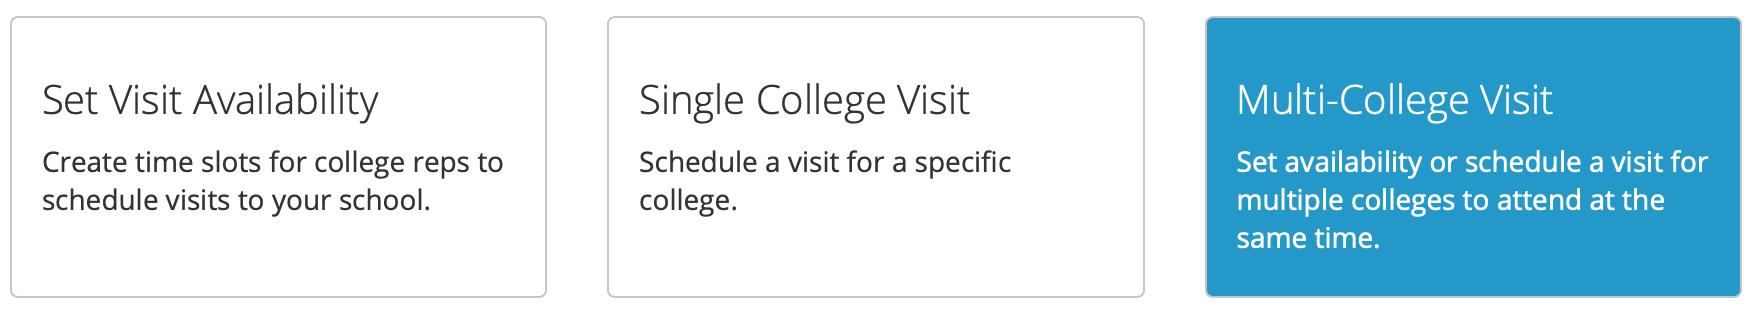 _counselor_-calendar-schedule-visit-multi-college.png